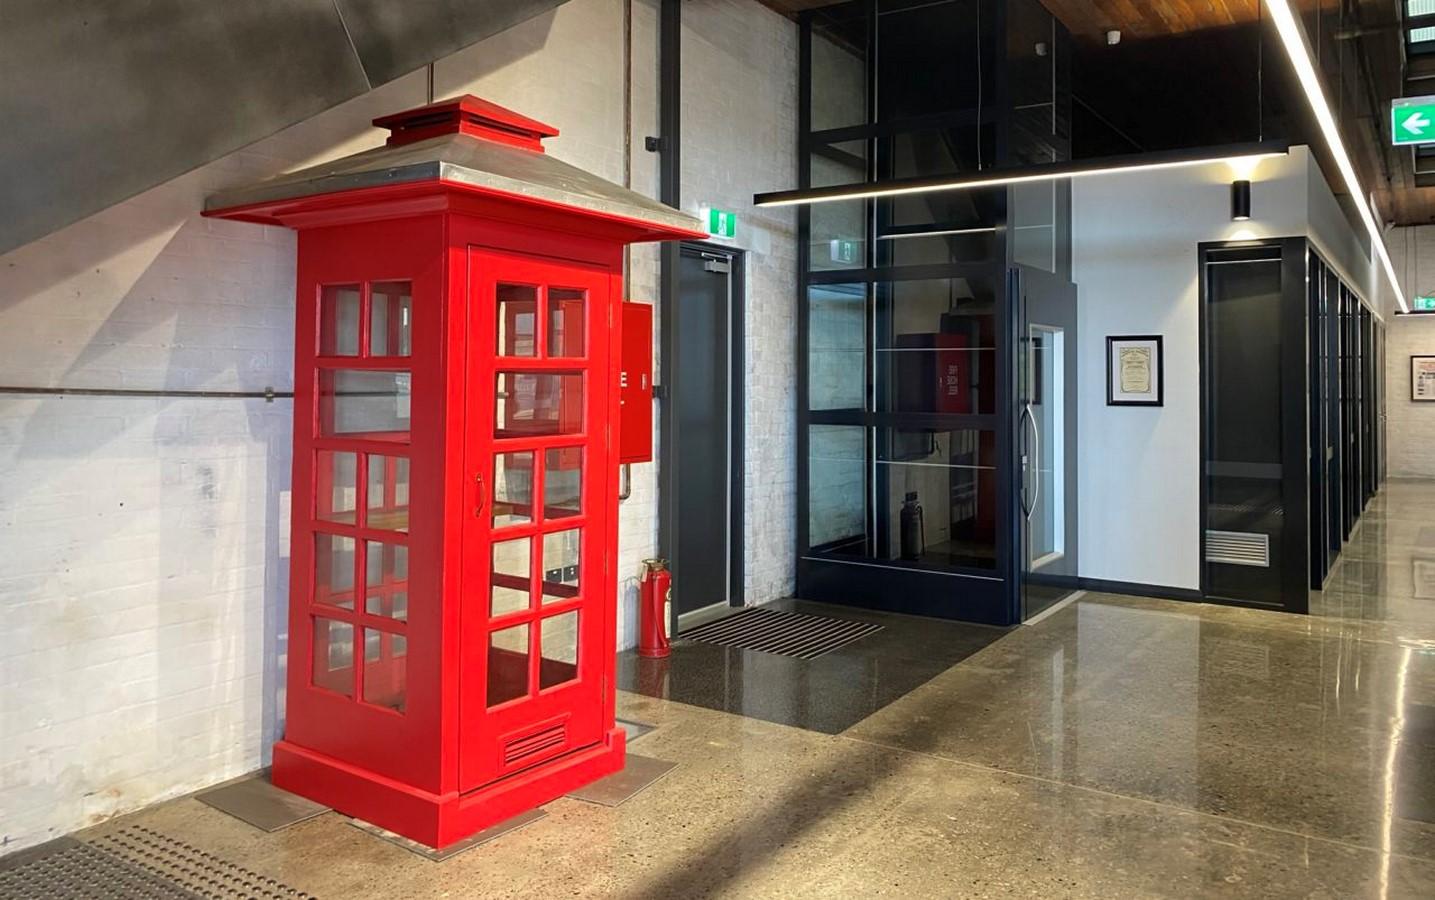 Midland Auctioneer's Heritage Office - Sheet2